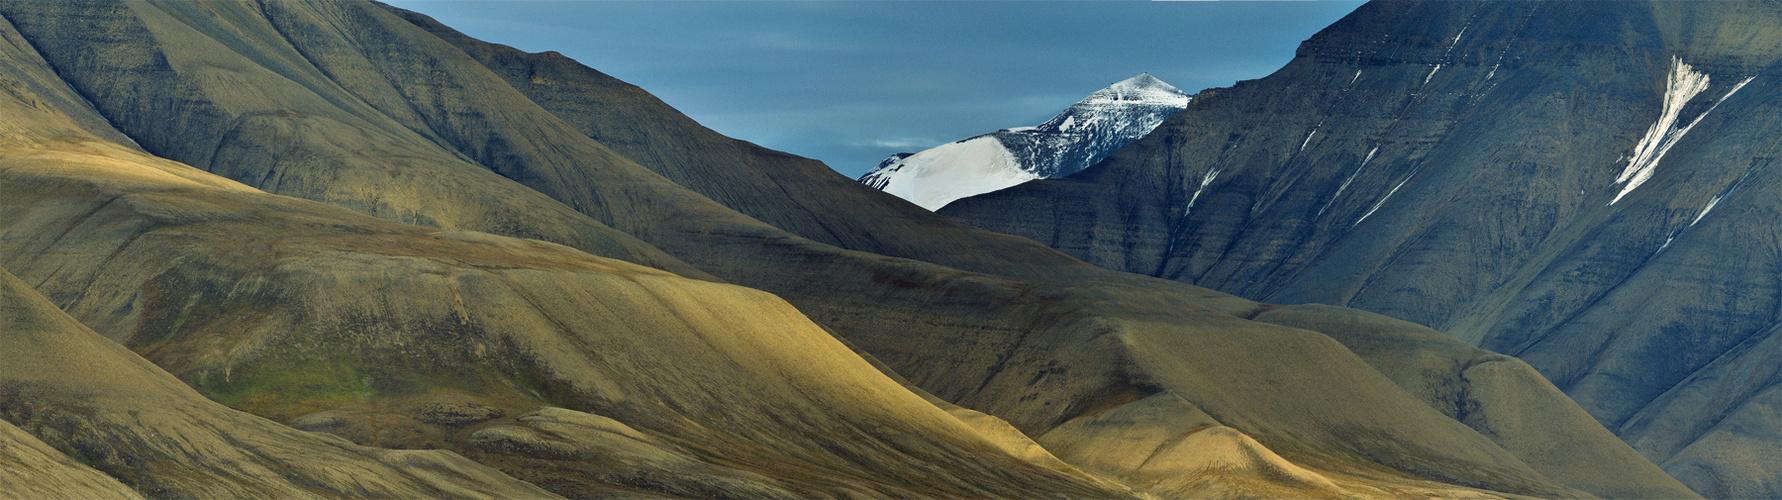 Sassen-Bünsow-Land-Nationalpark, Spitzbergen, Norwegen